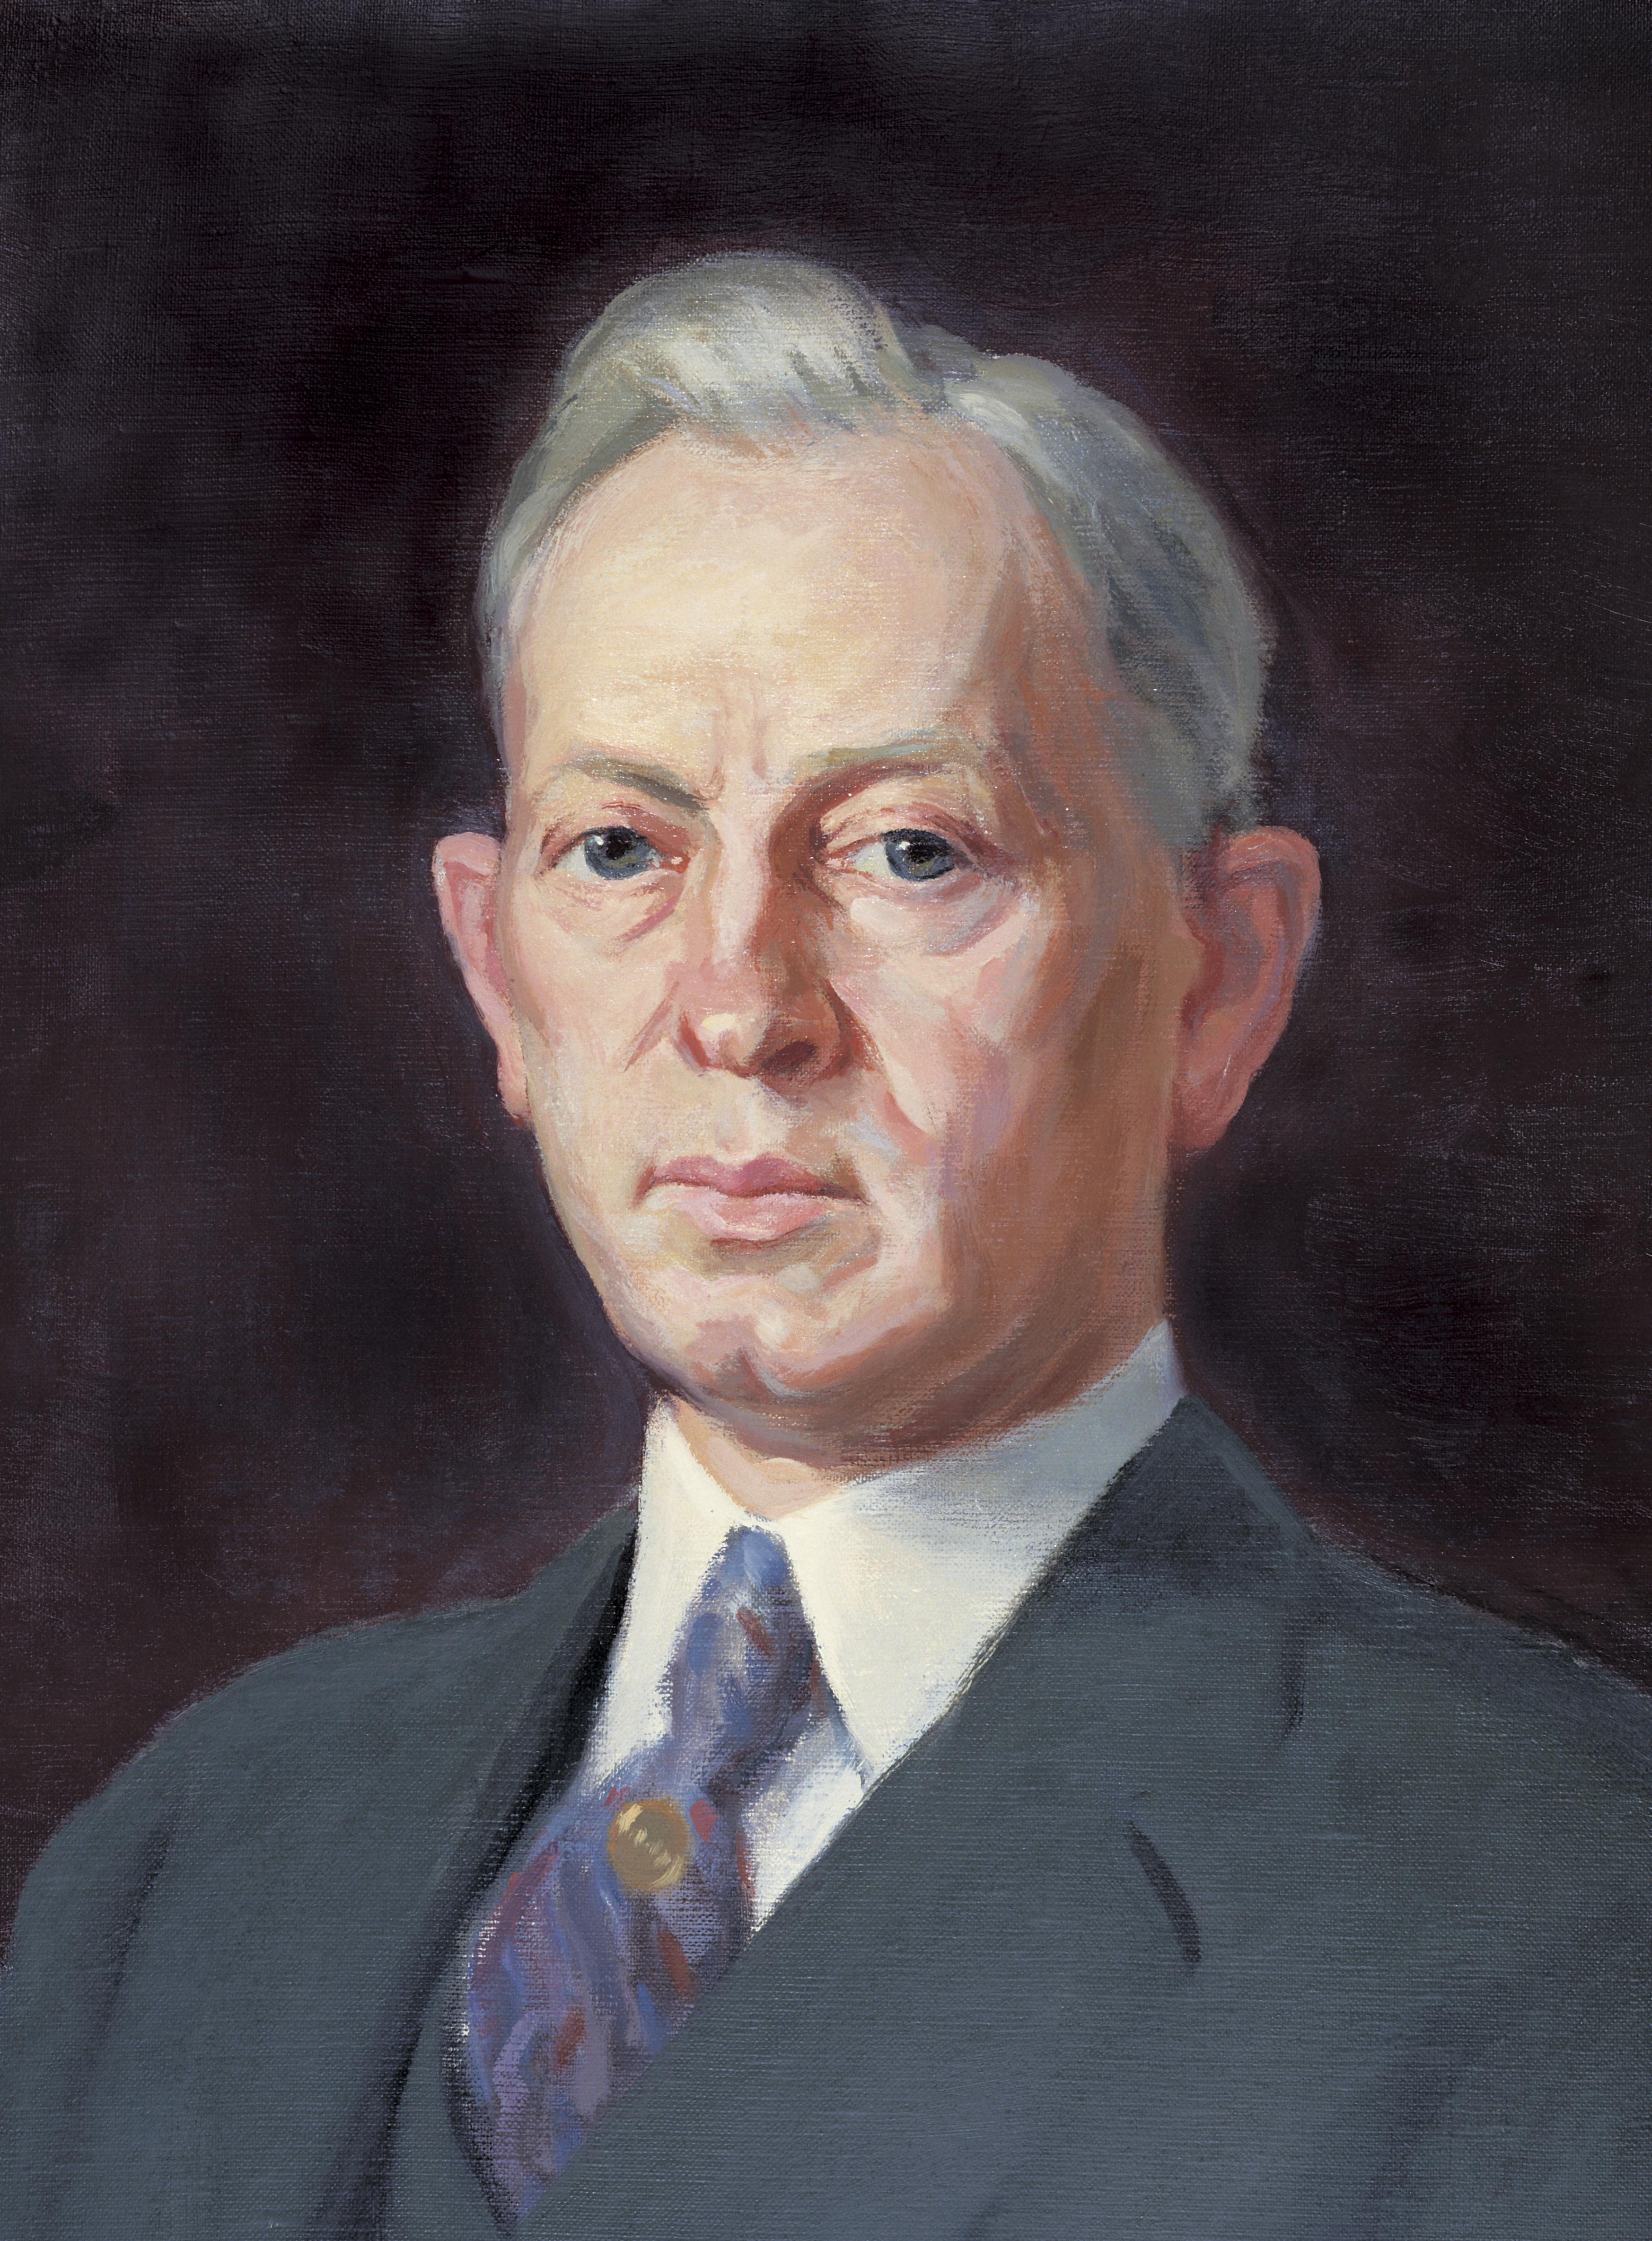 A portrait painting of the prophet Joseph Fielding Smith in a suit.